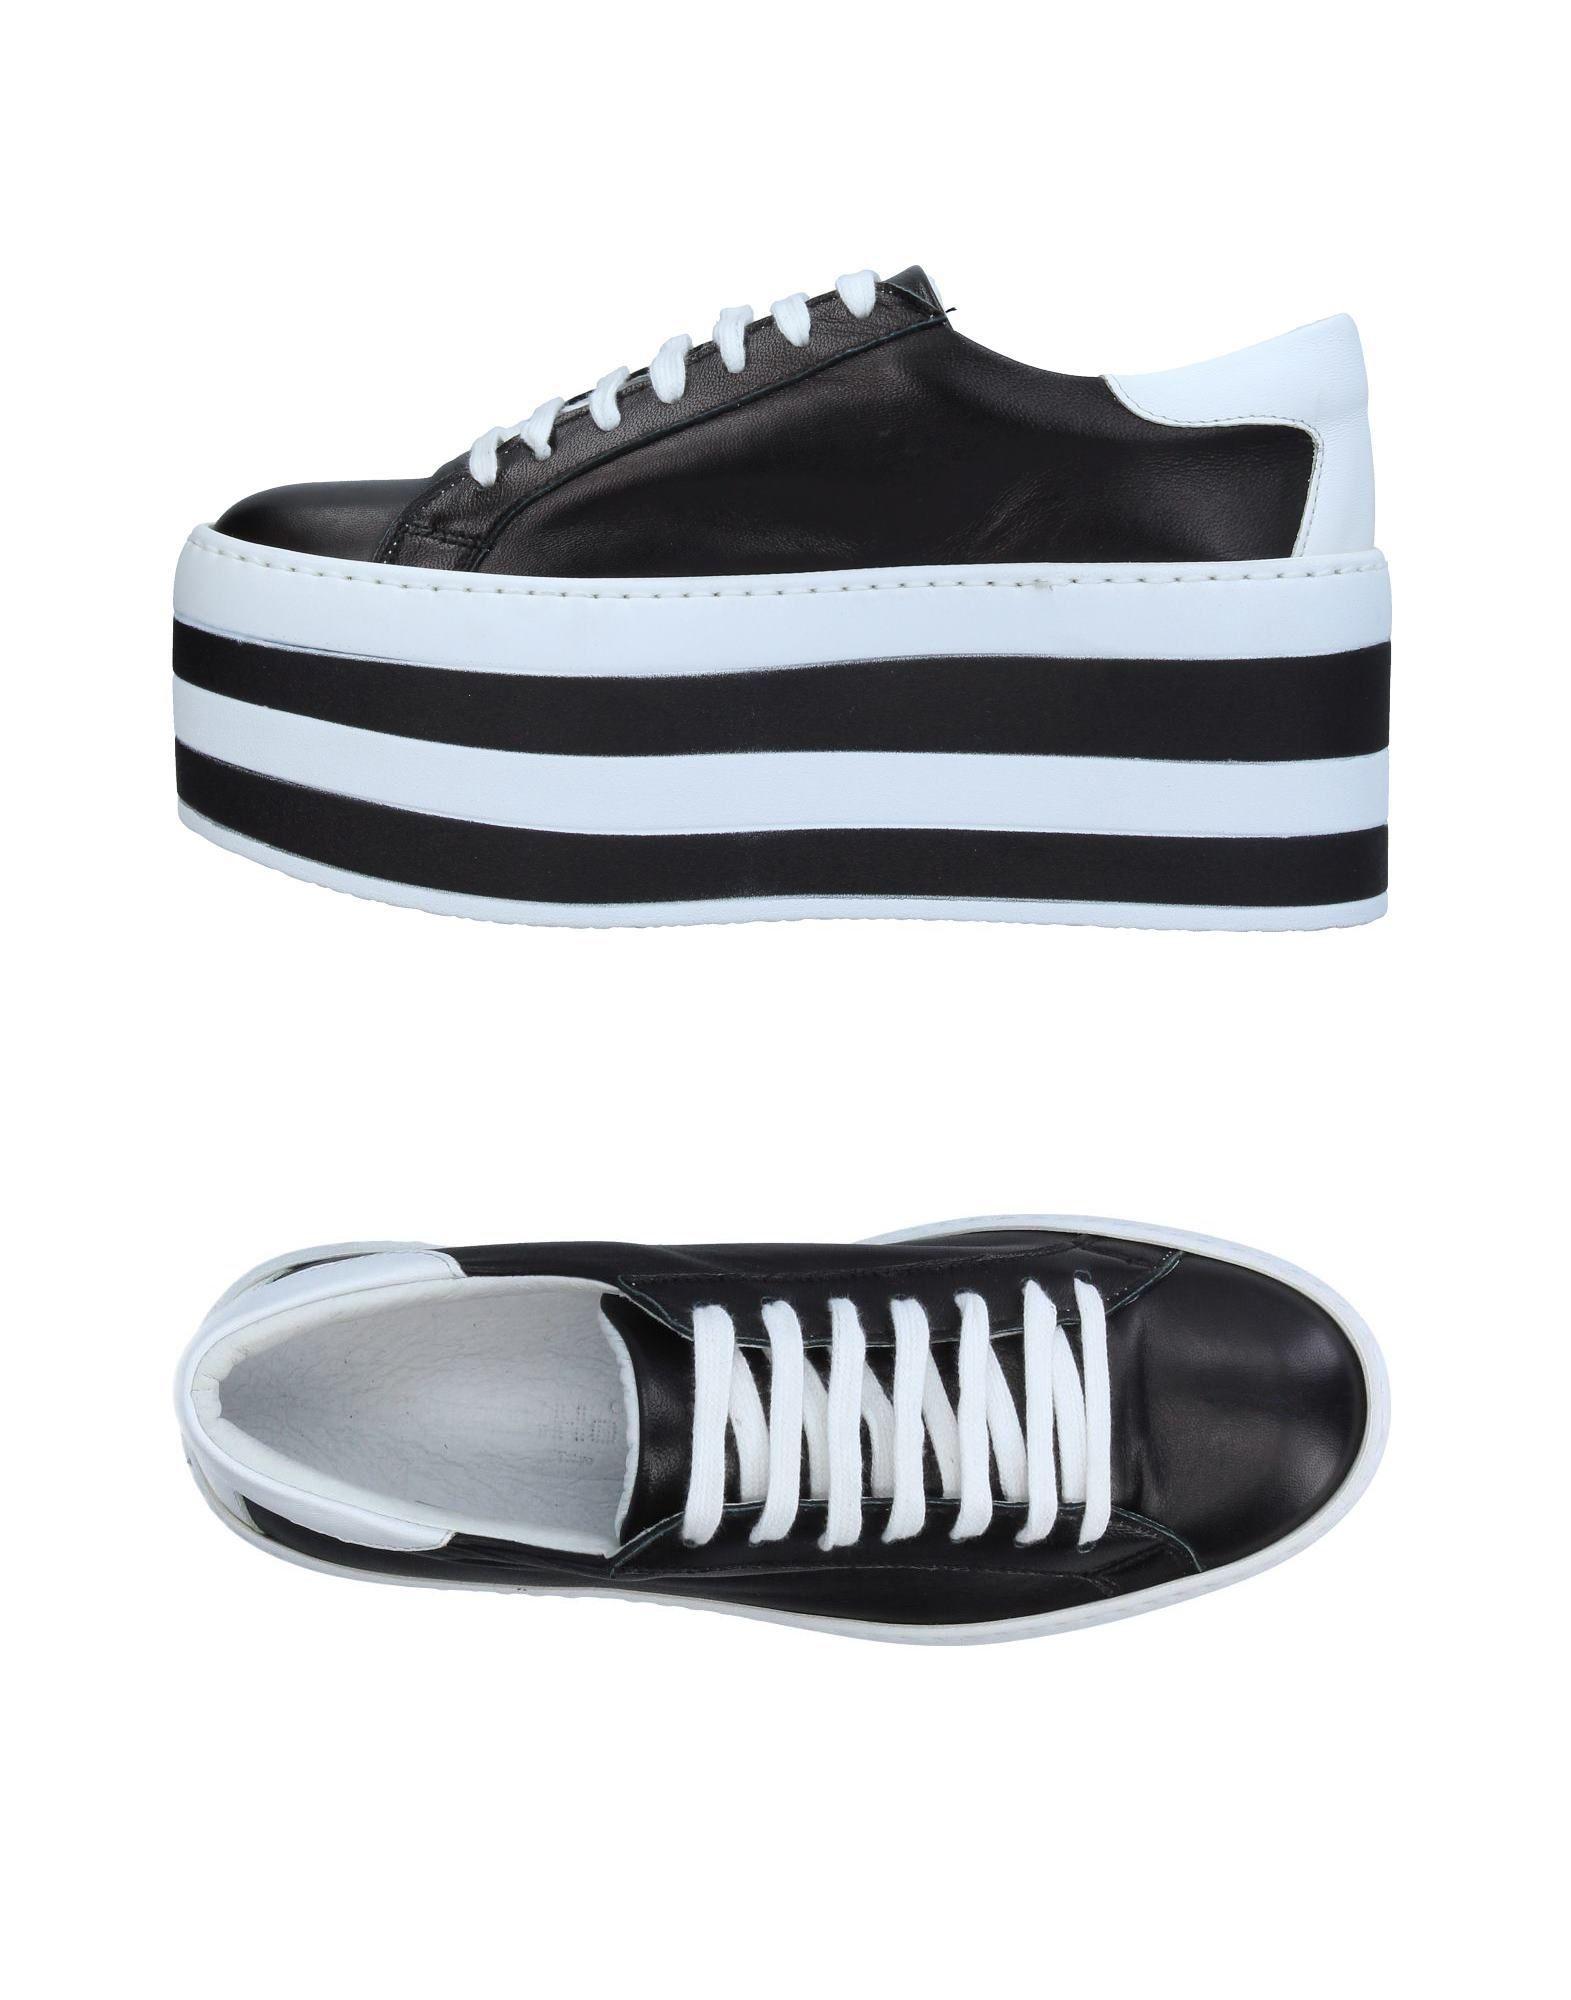 Moda Sneakers 11367228JT Jeremy-Ho Donna - 11367228JT Sneakers 0d36d0